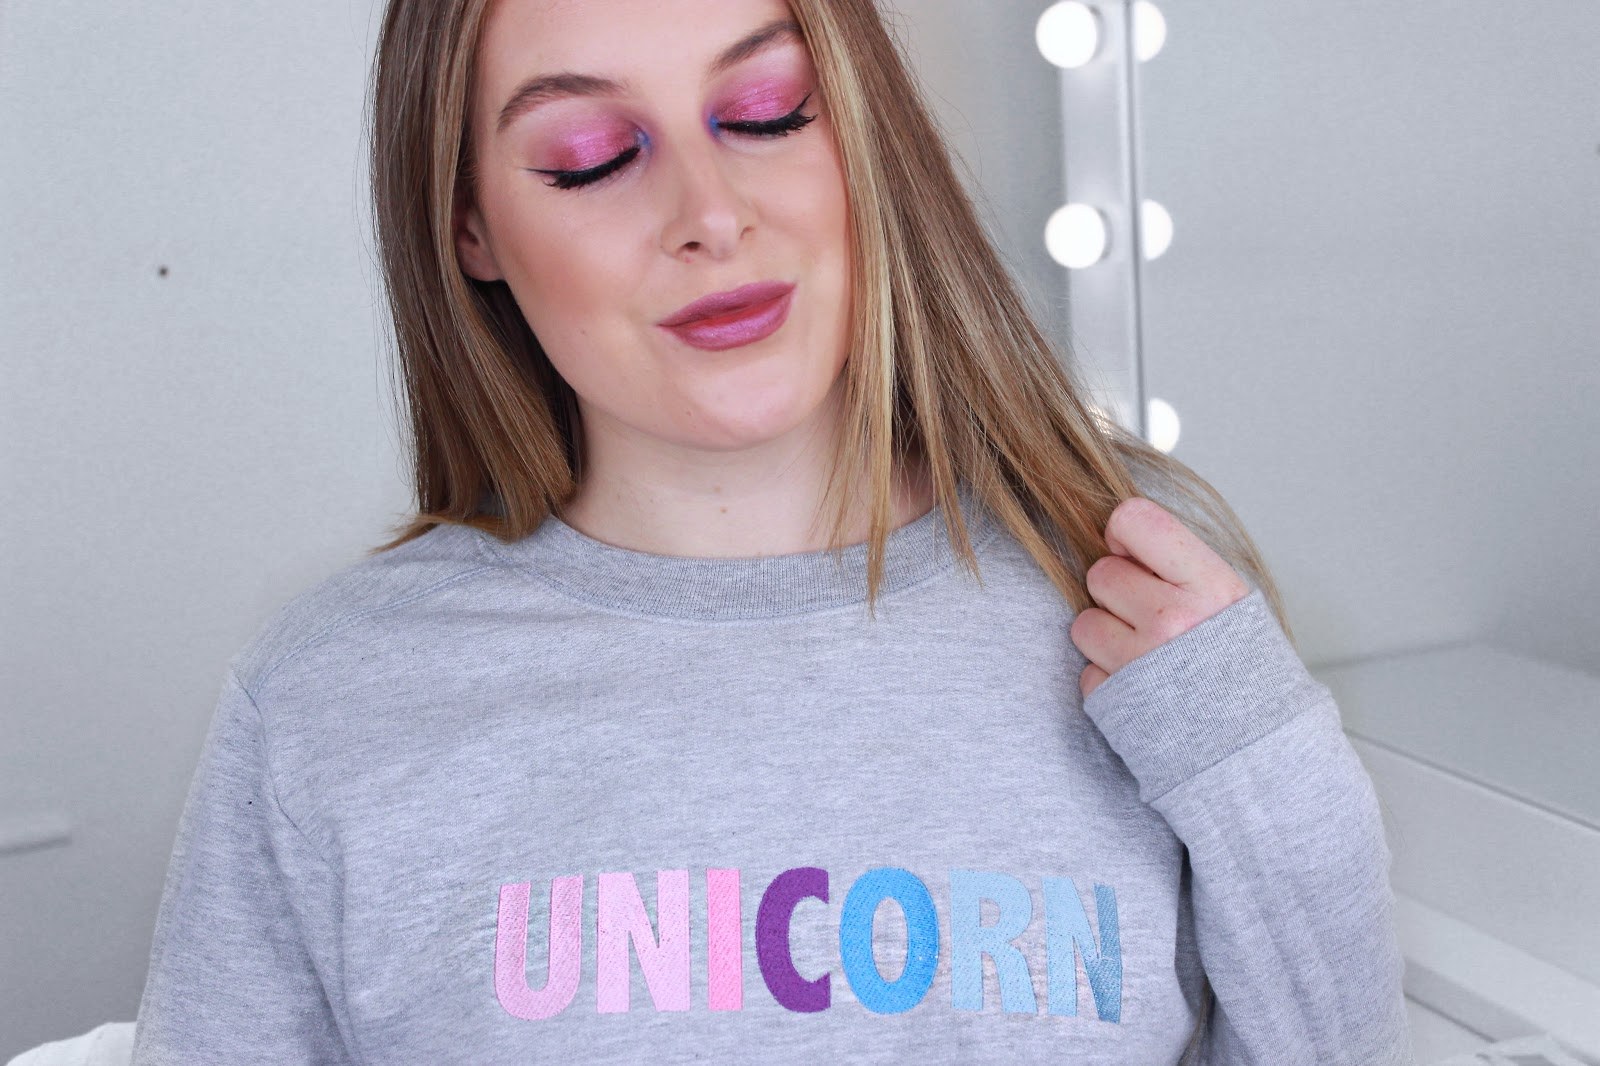 Unicorn Glossybox Sweatshirt